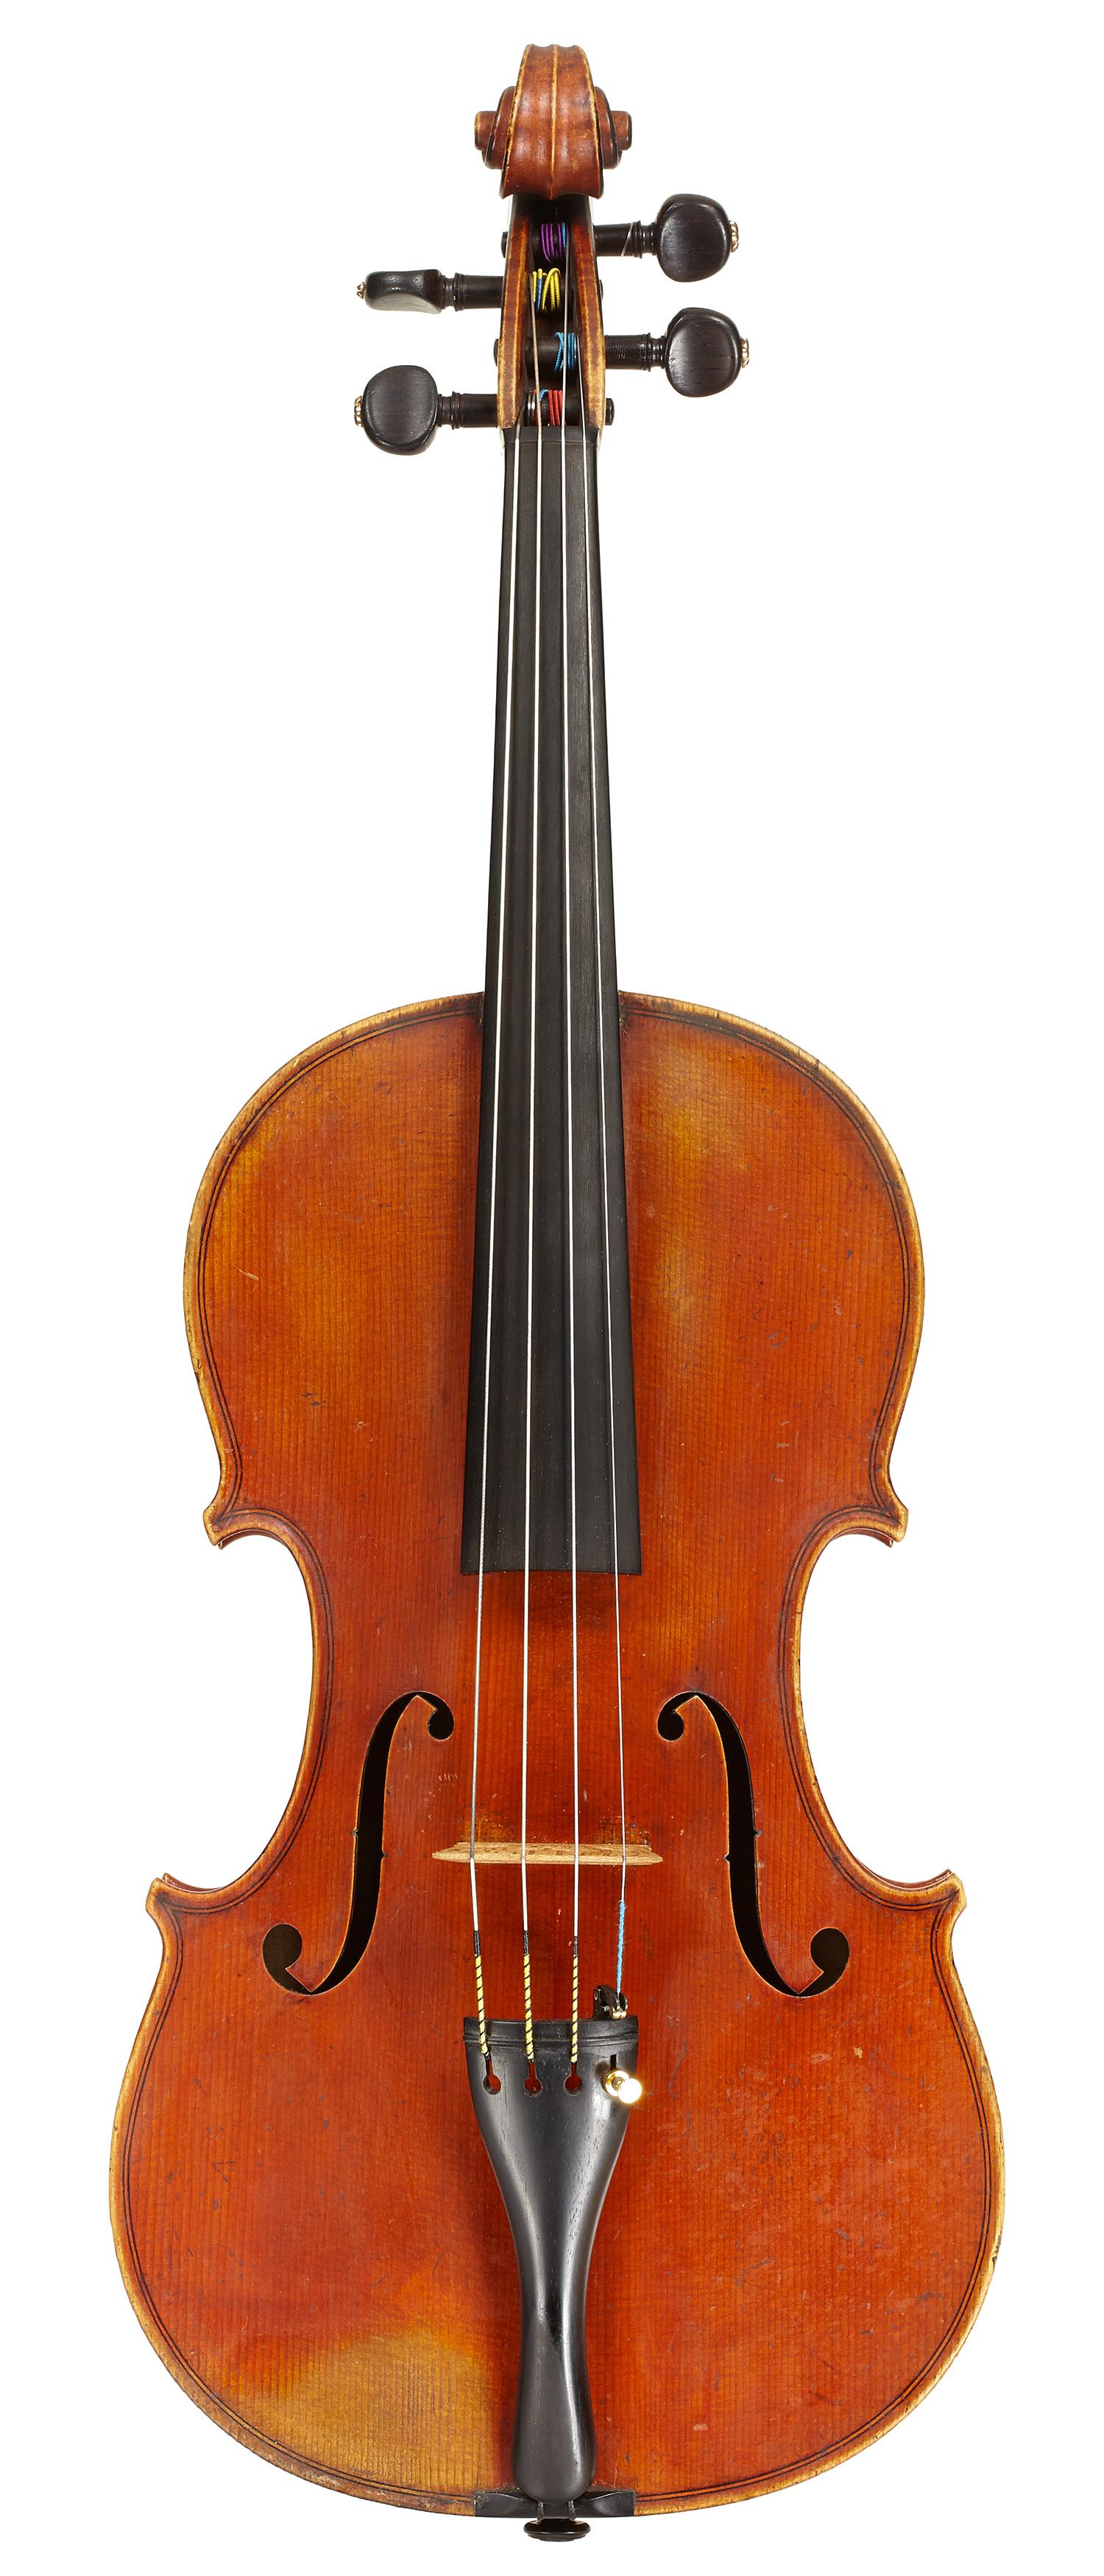 D'Espine viola top